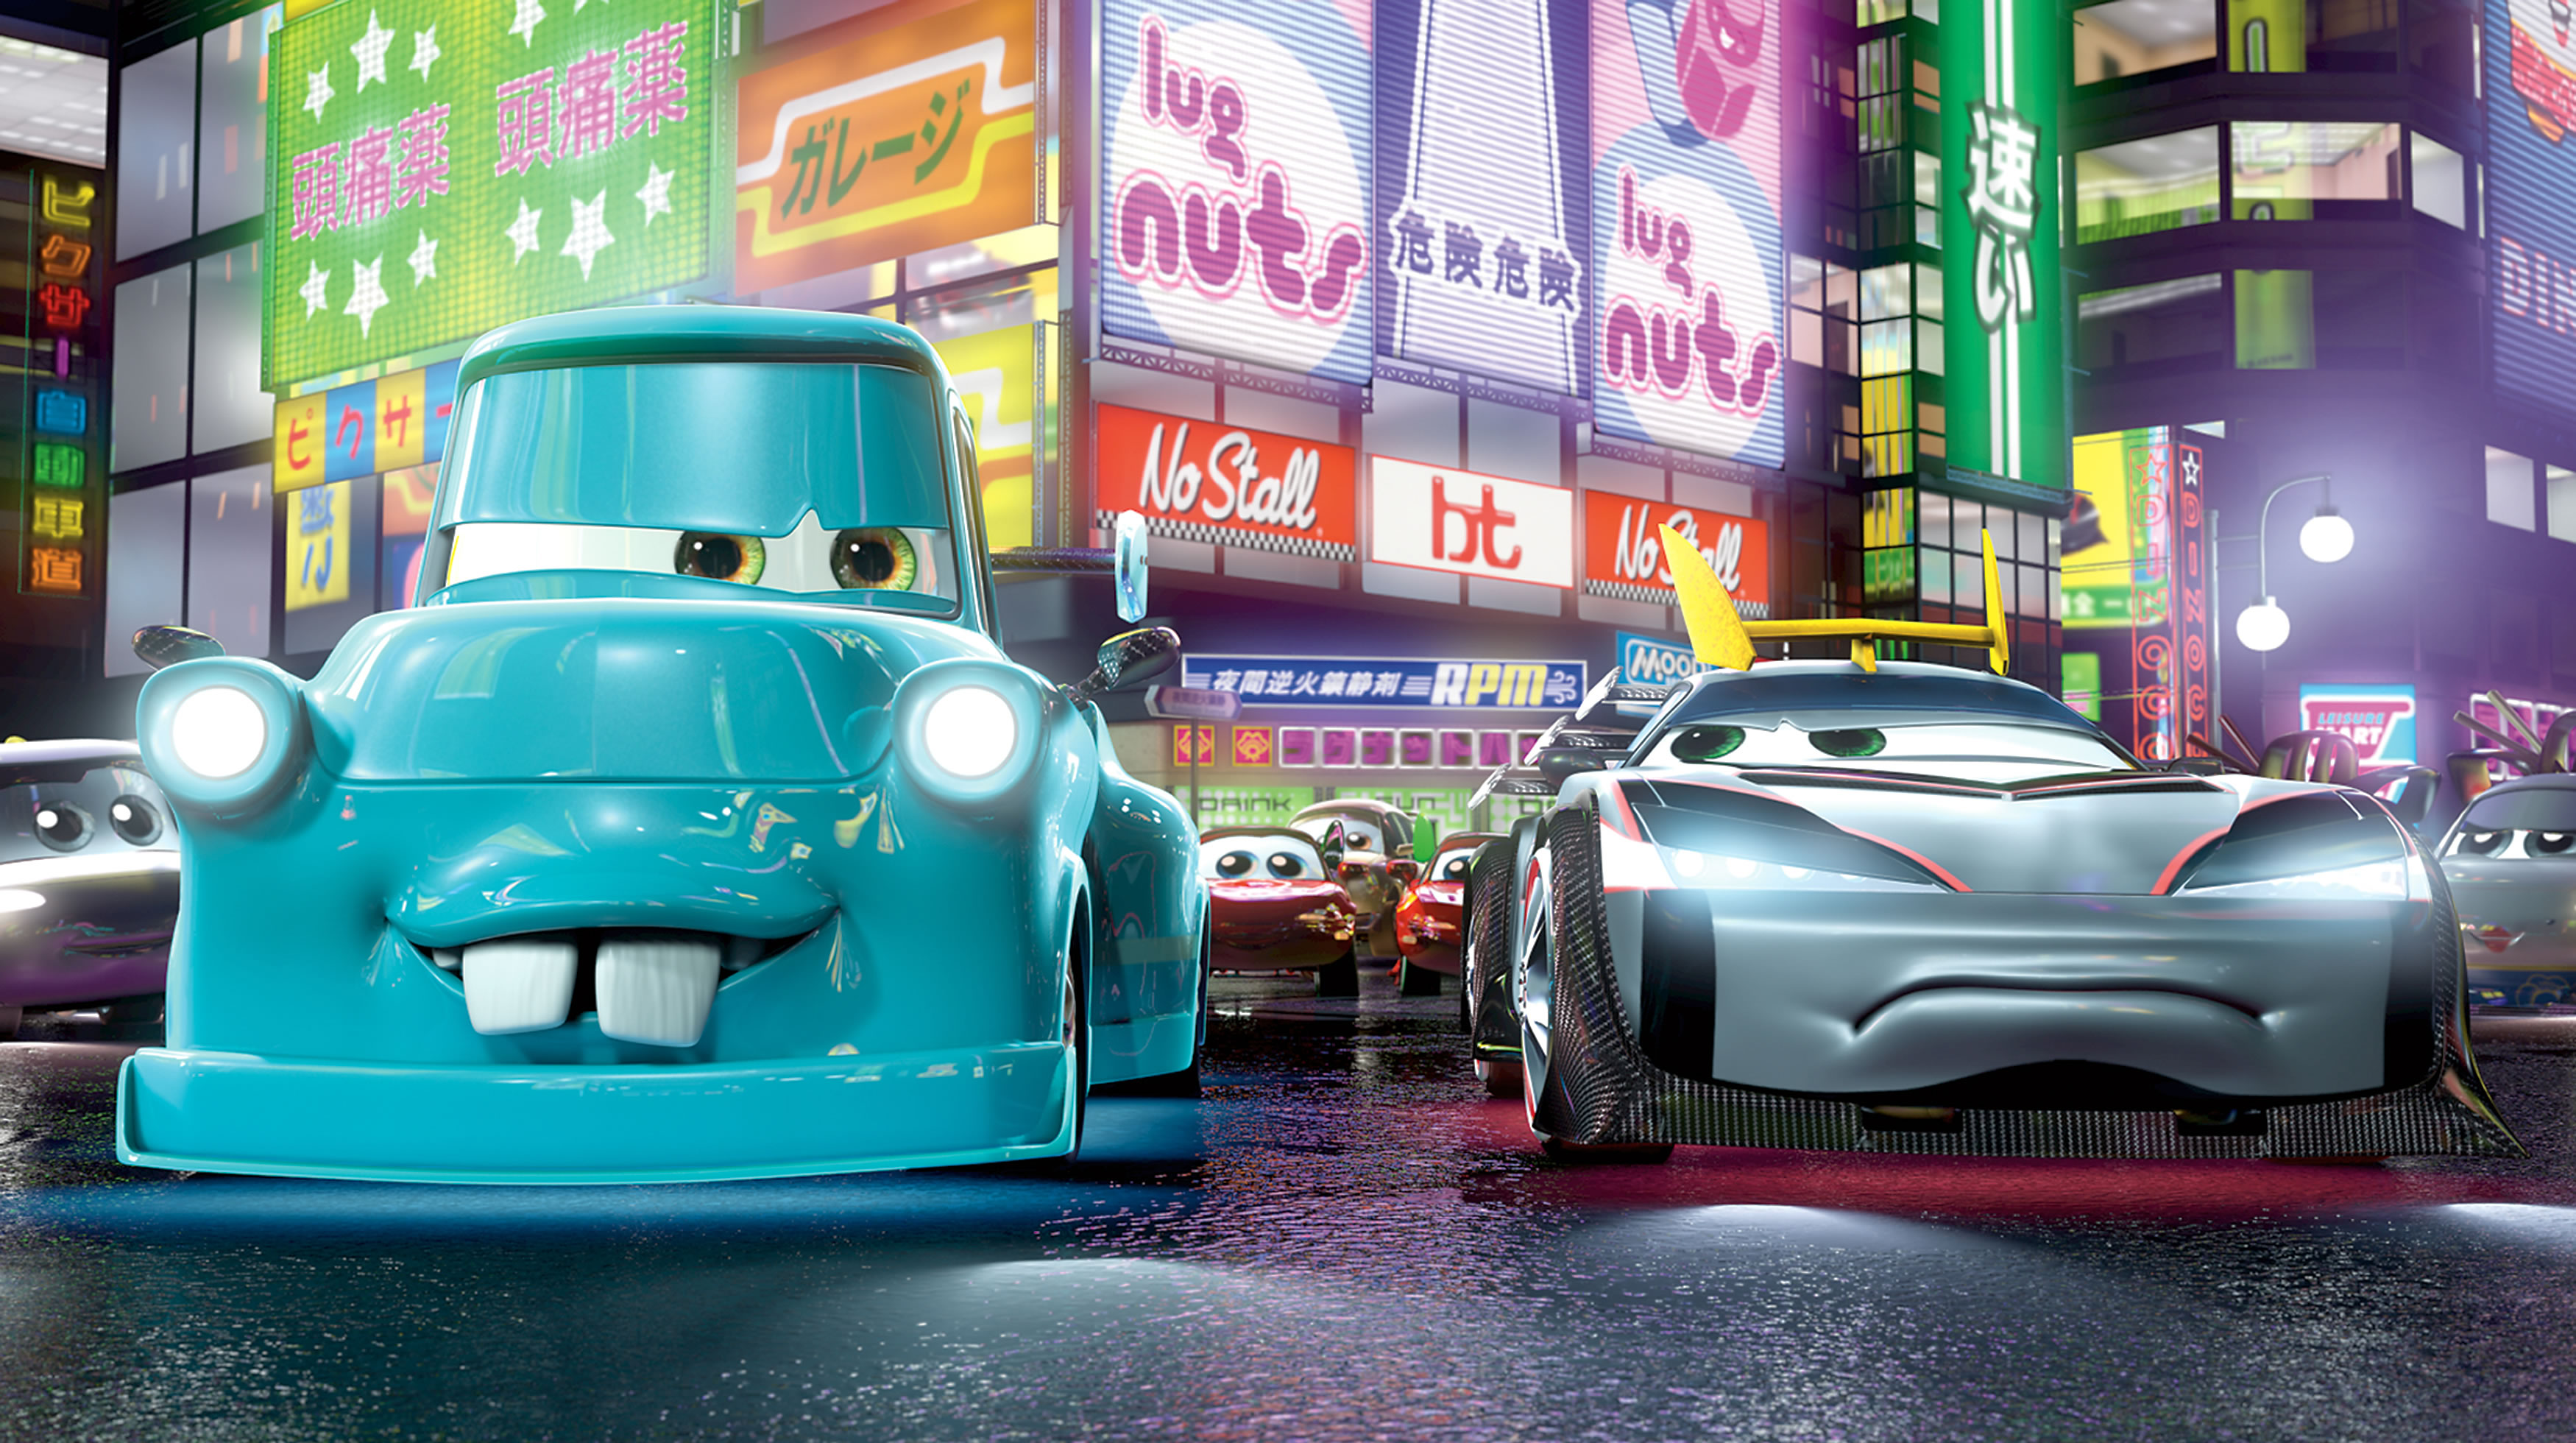 Fritz' Blog: Disney Pixar's Tokyo Mater